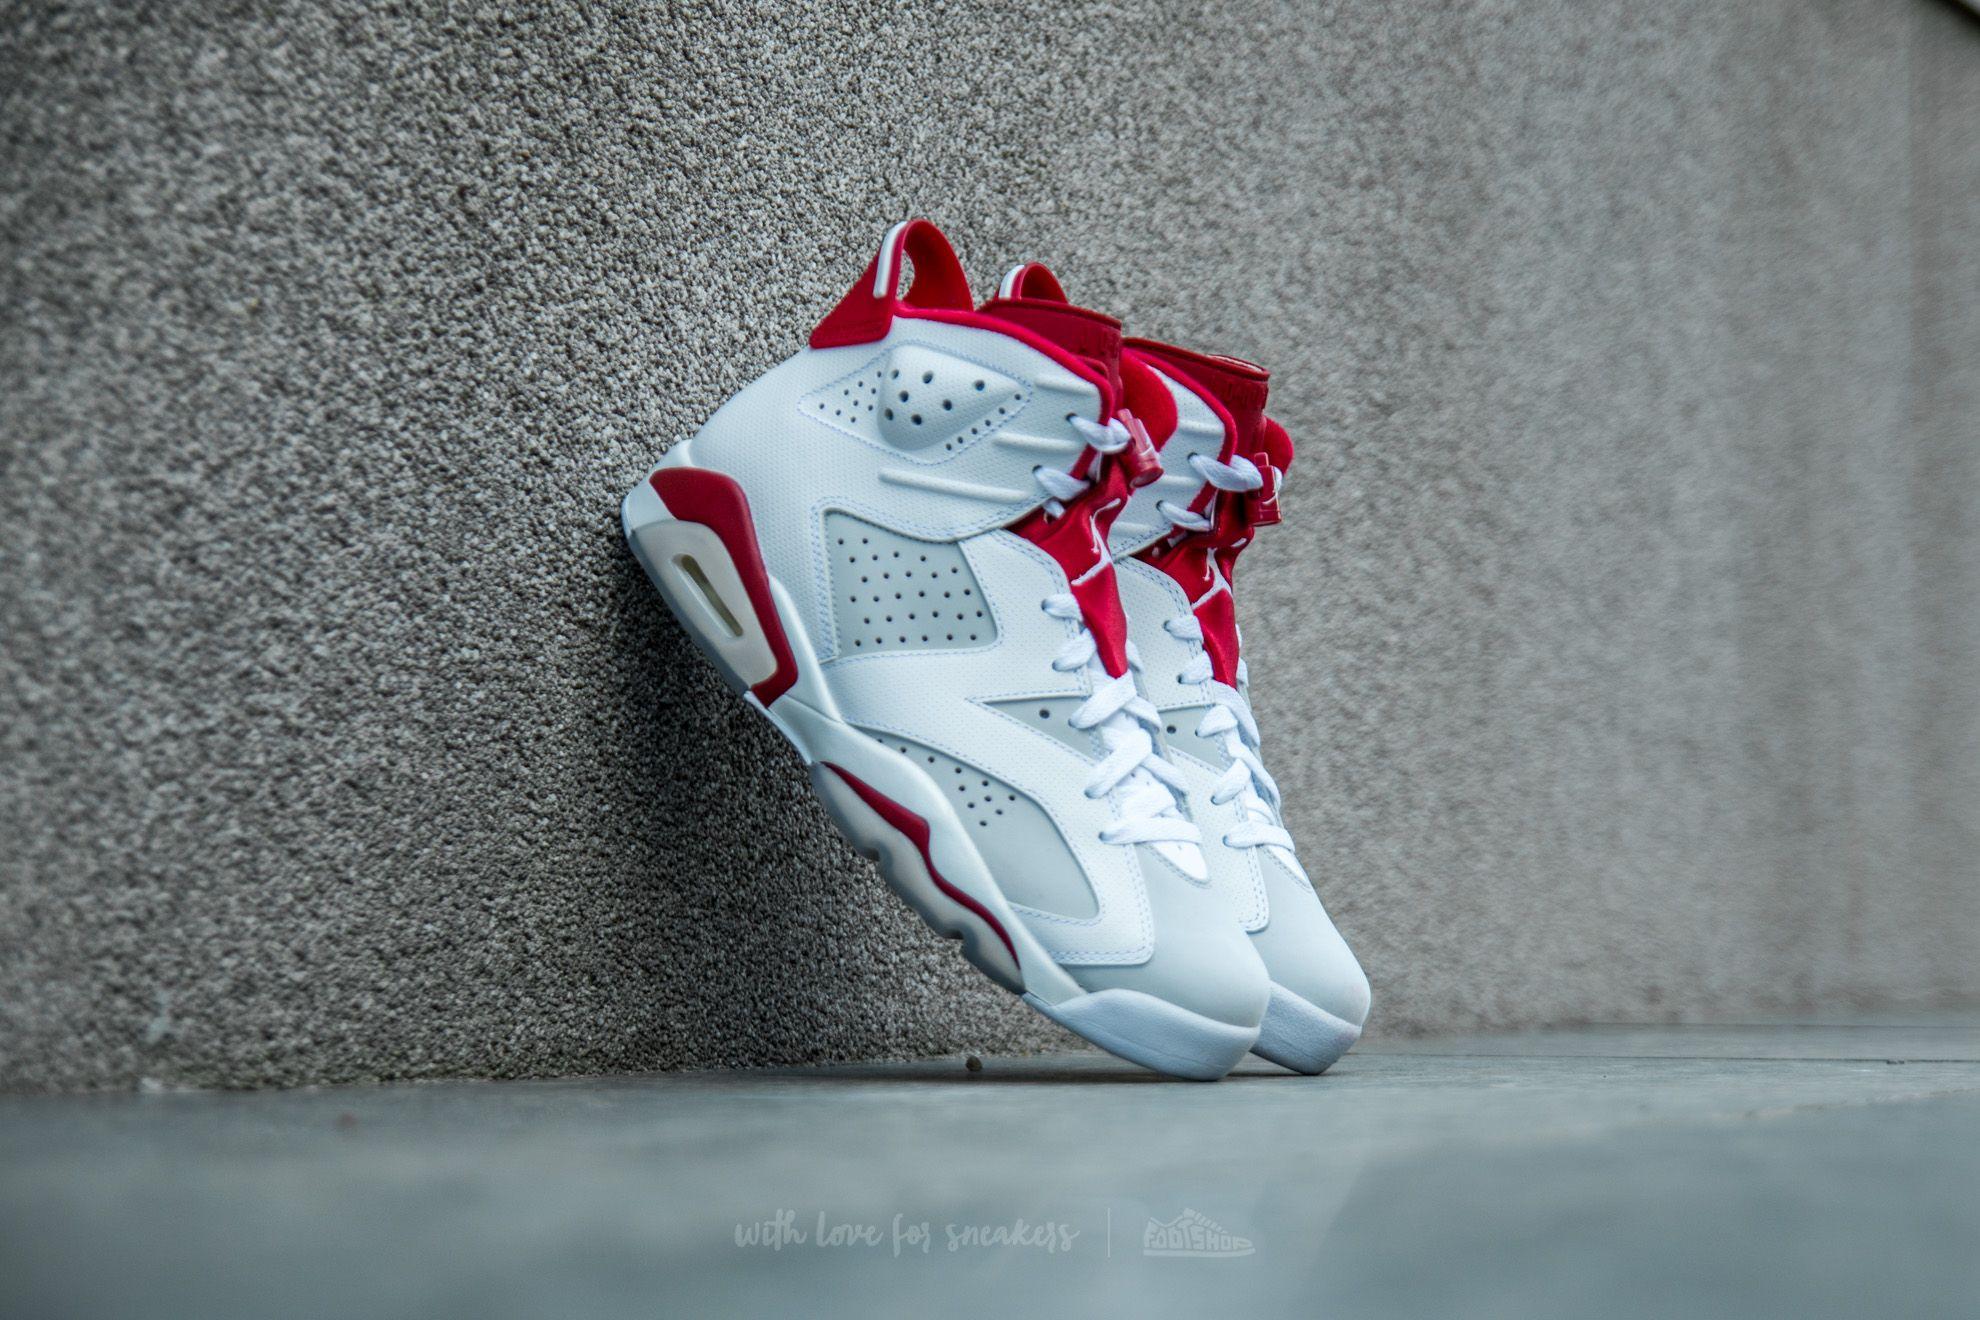 Air Jordan 6 Retro White/ Gym Red-Pure Platinum